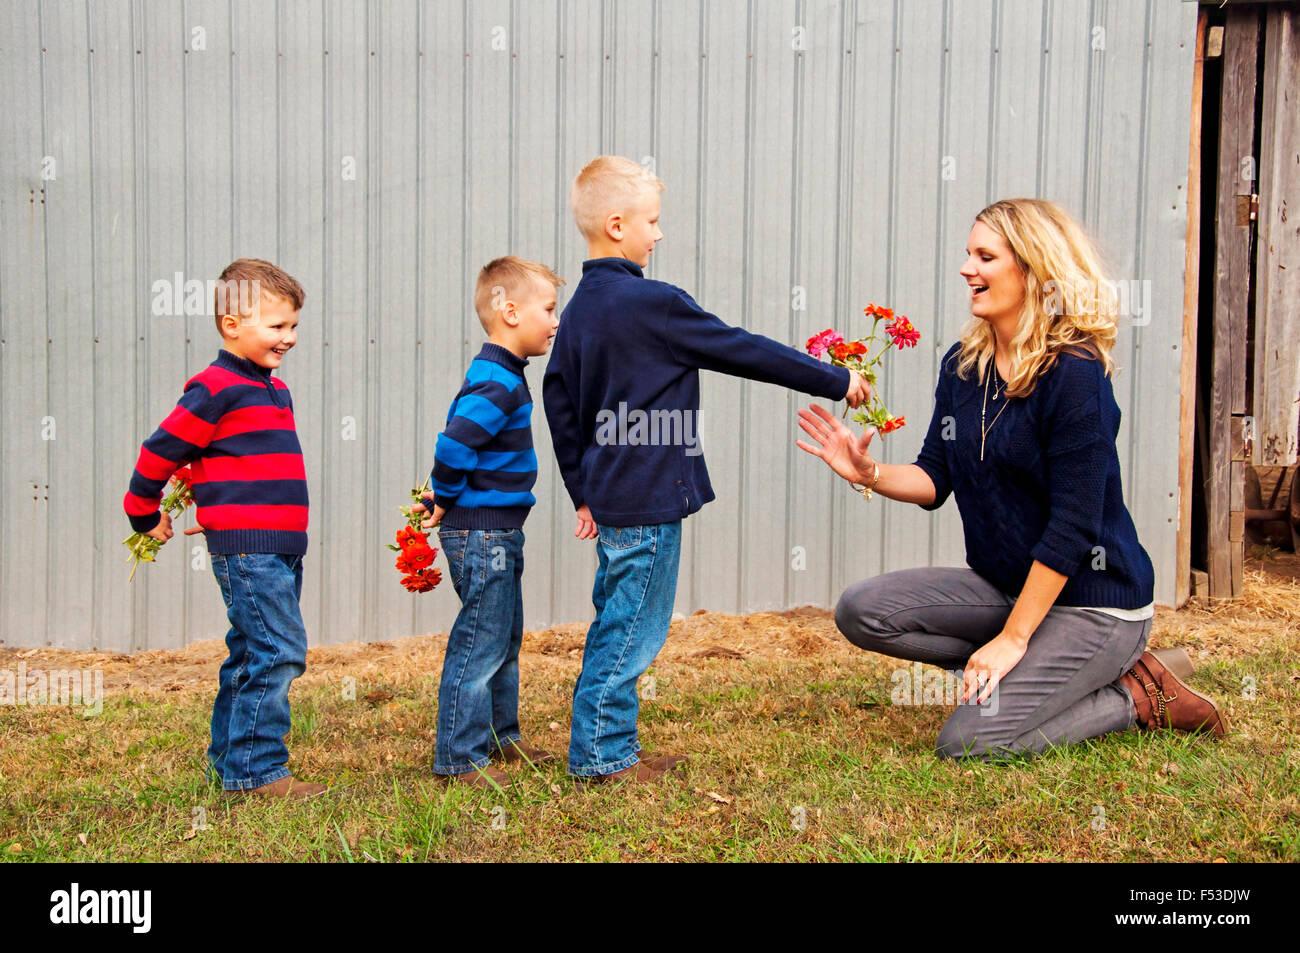 Boys giving mum flowers - Stock Image